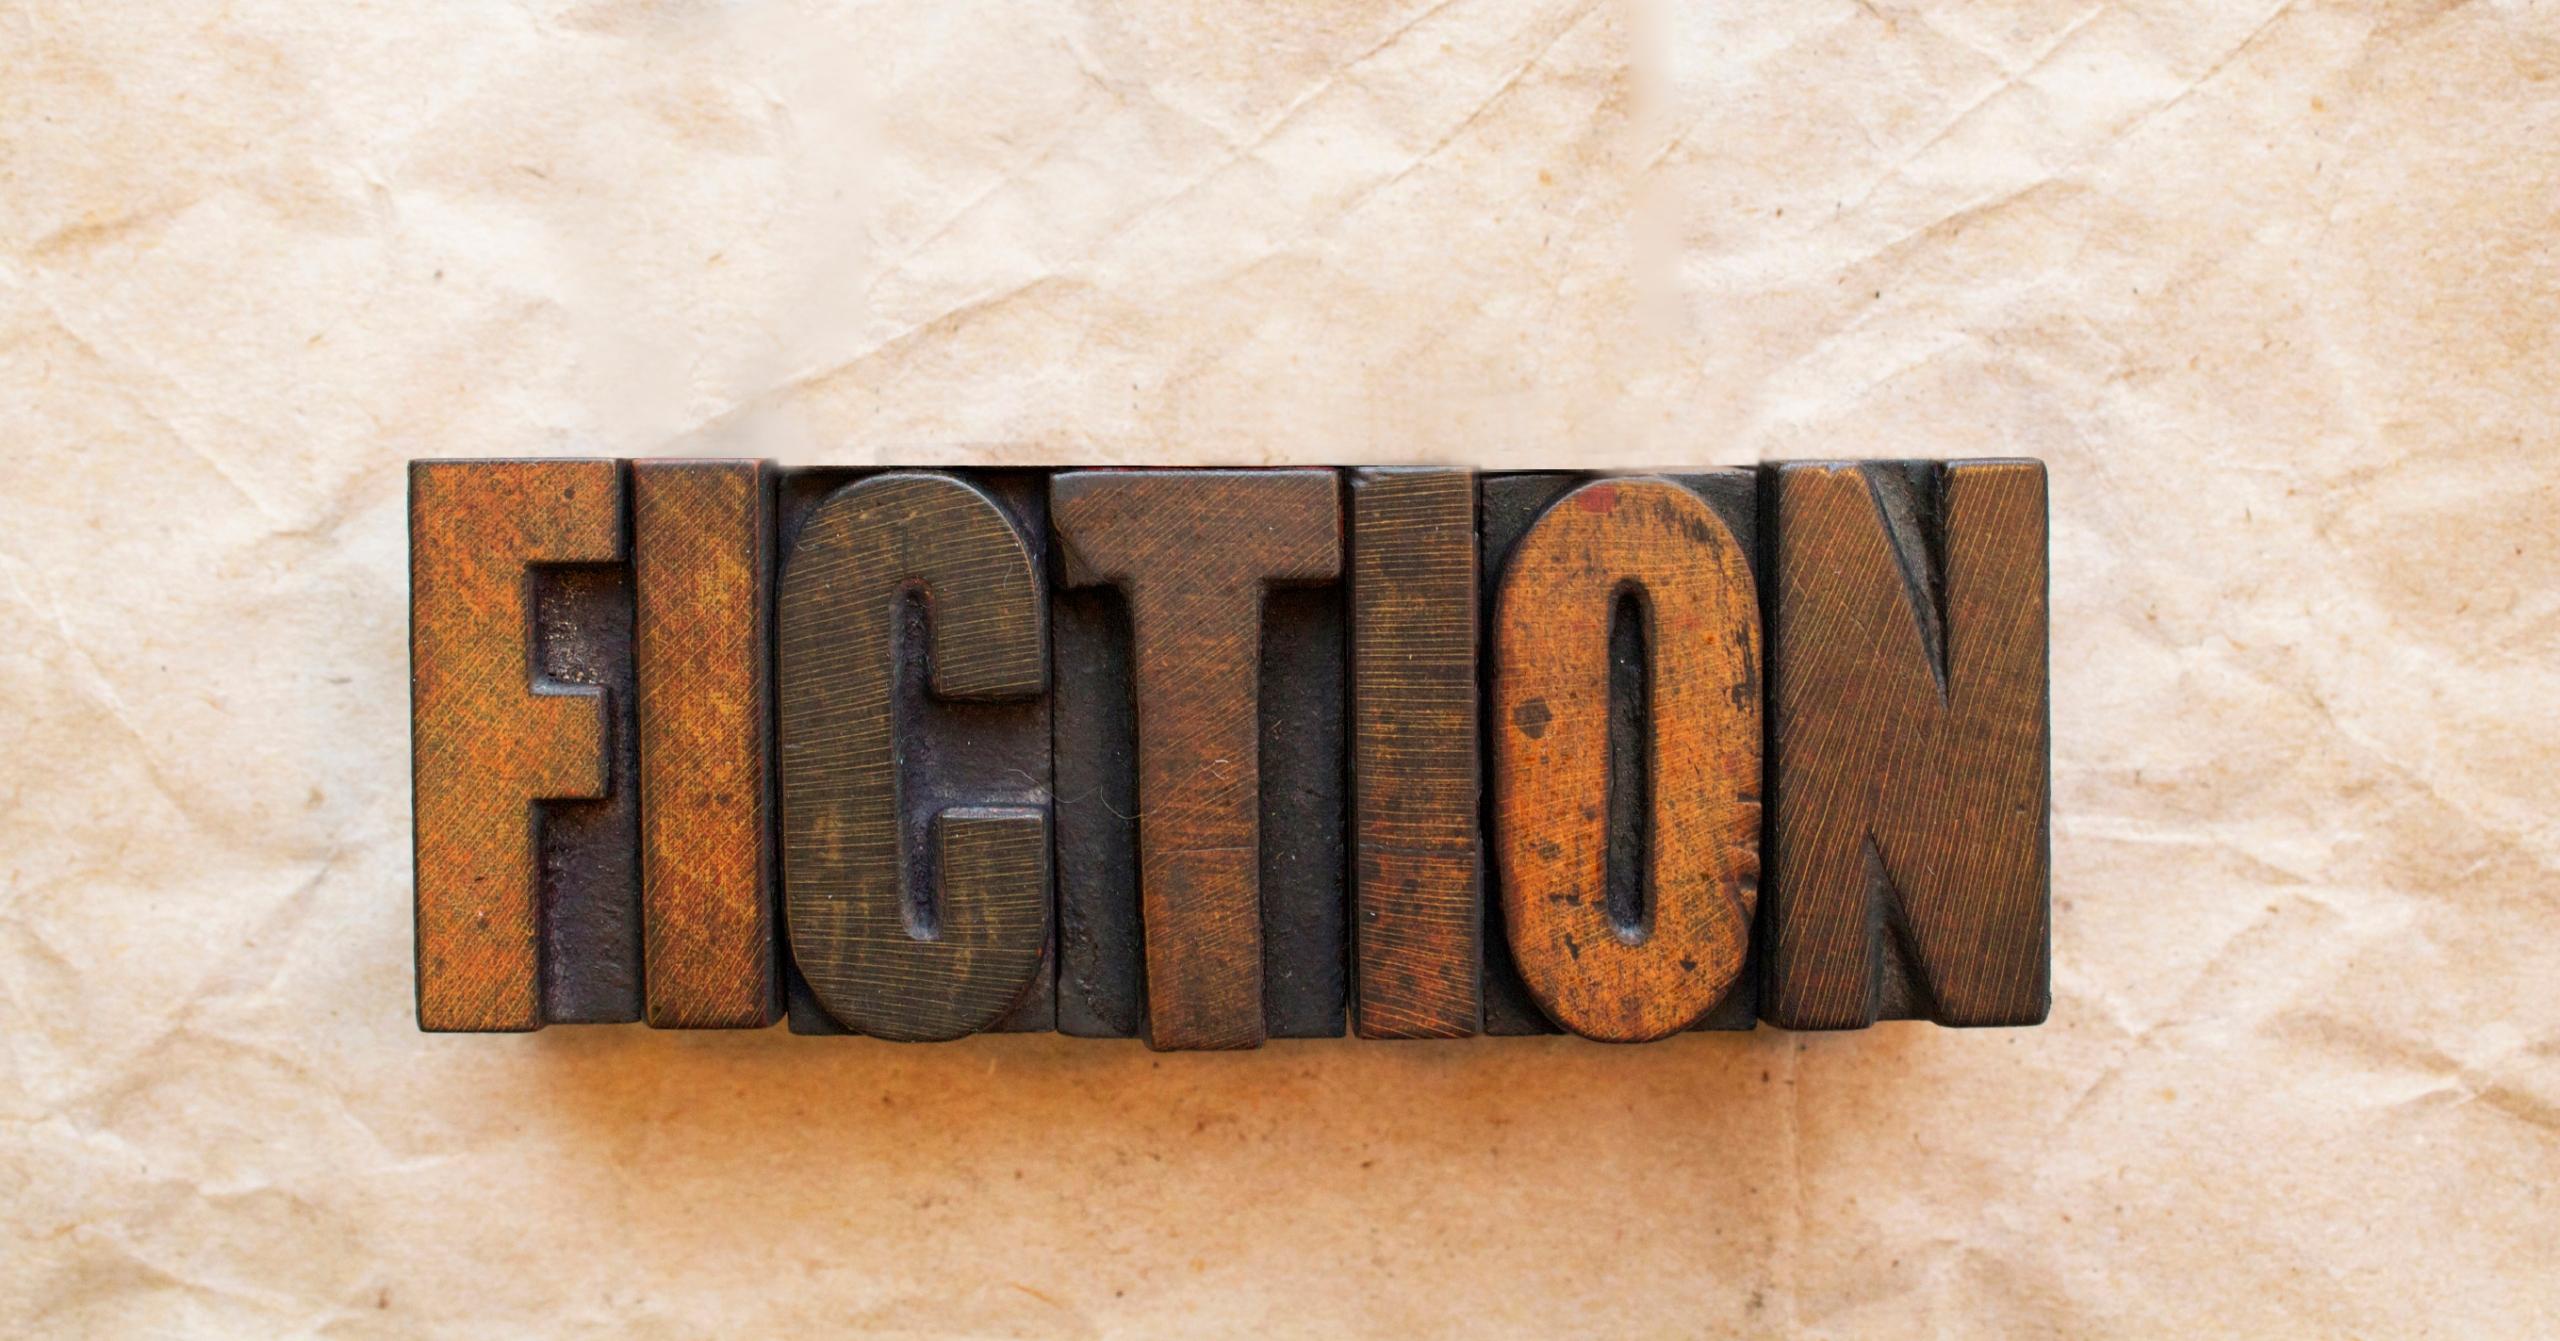 The word Nonfiction written in vintage wood letterpress type.